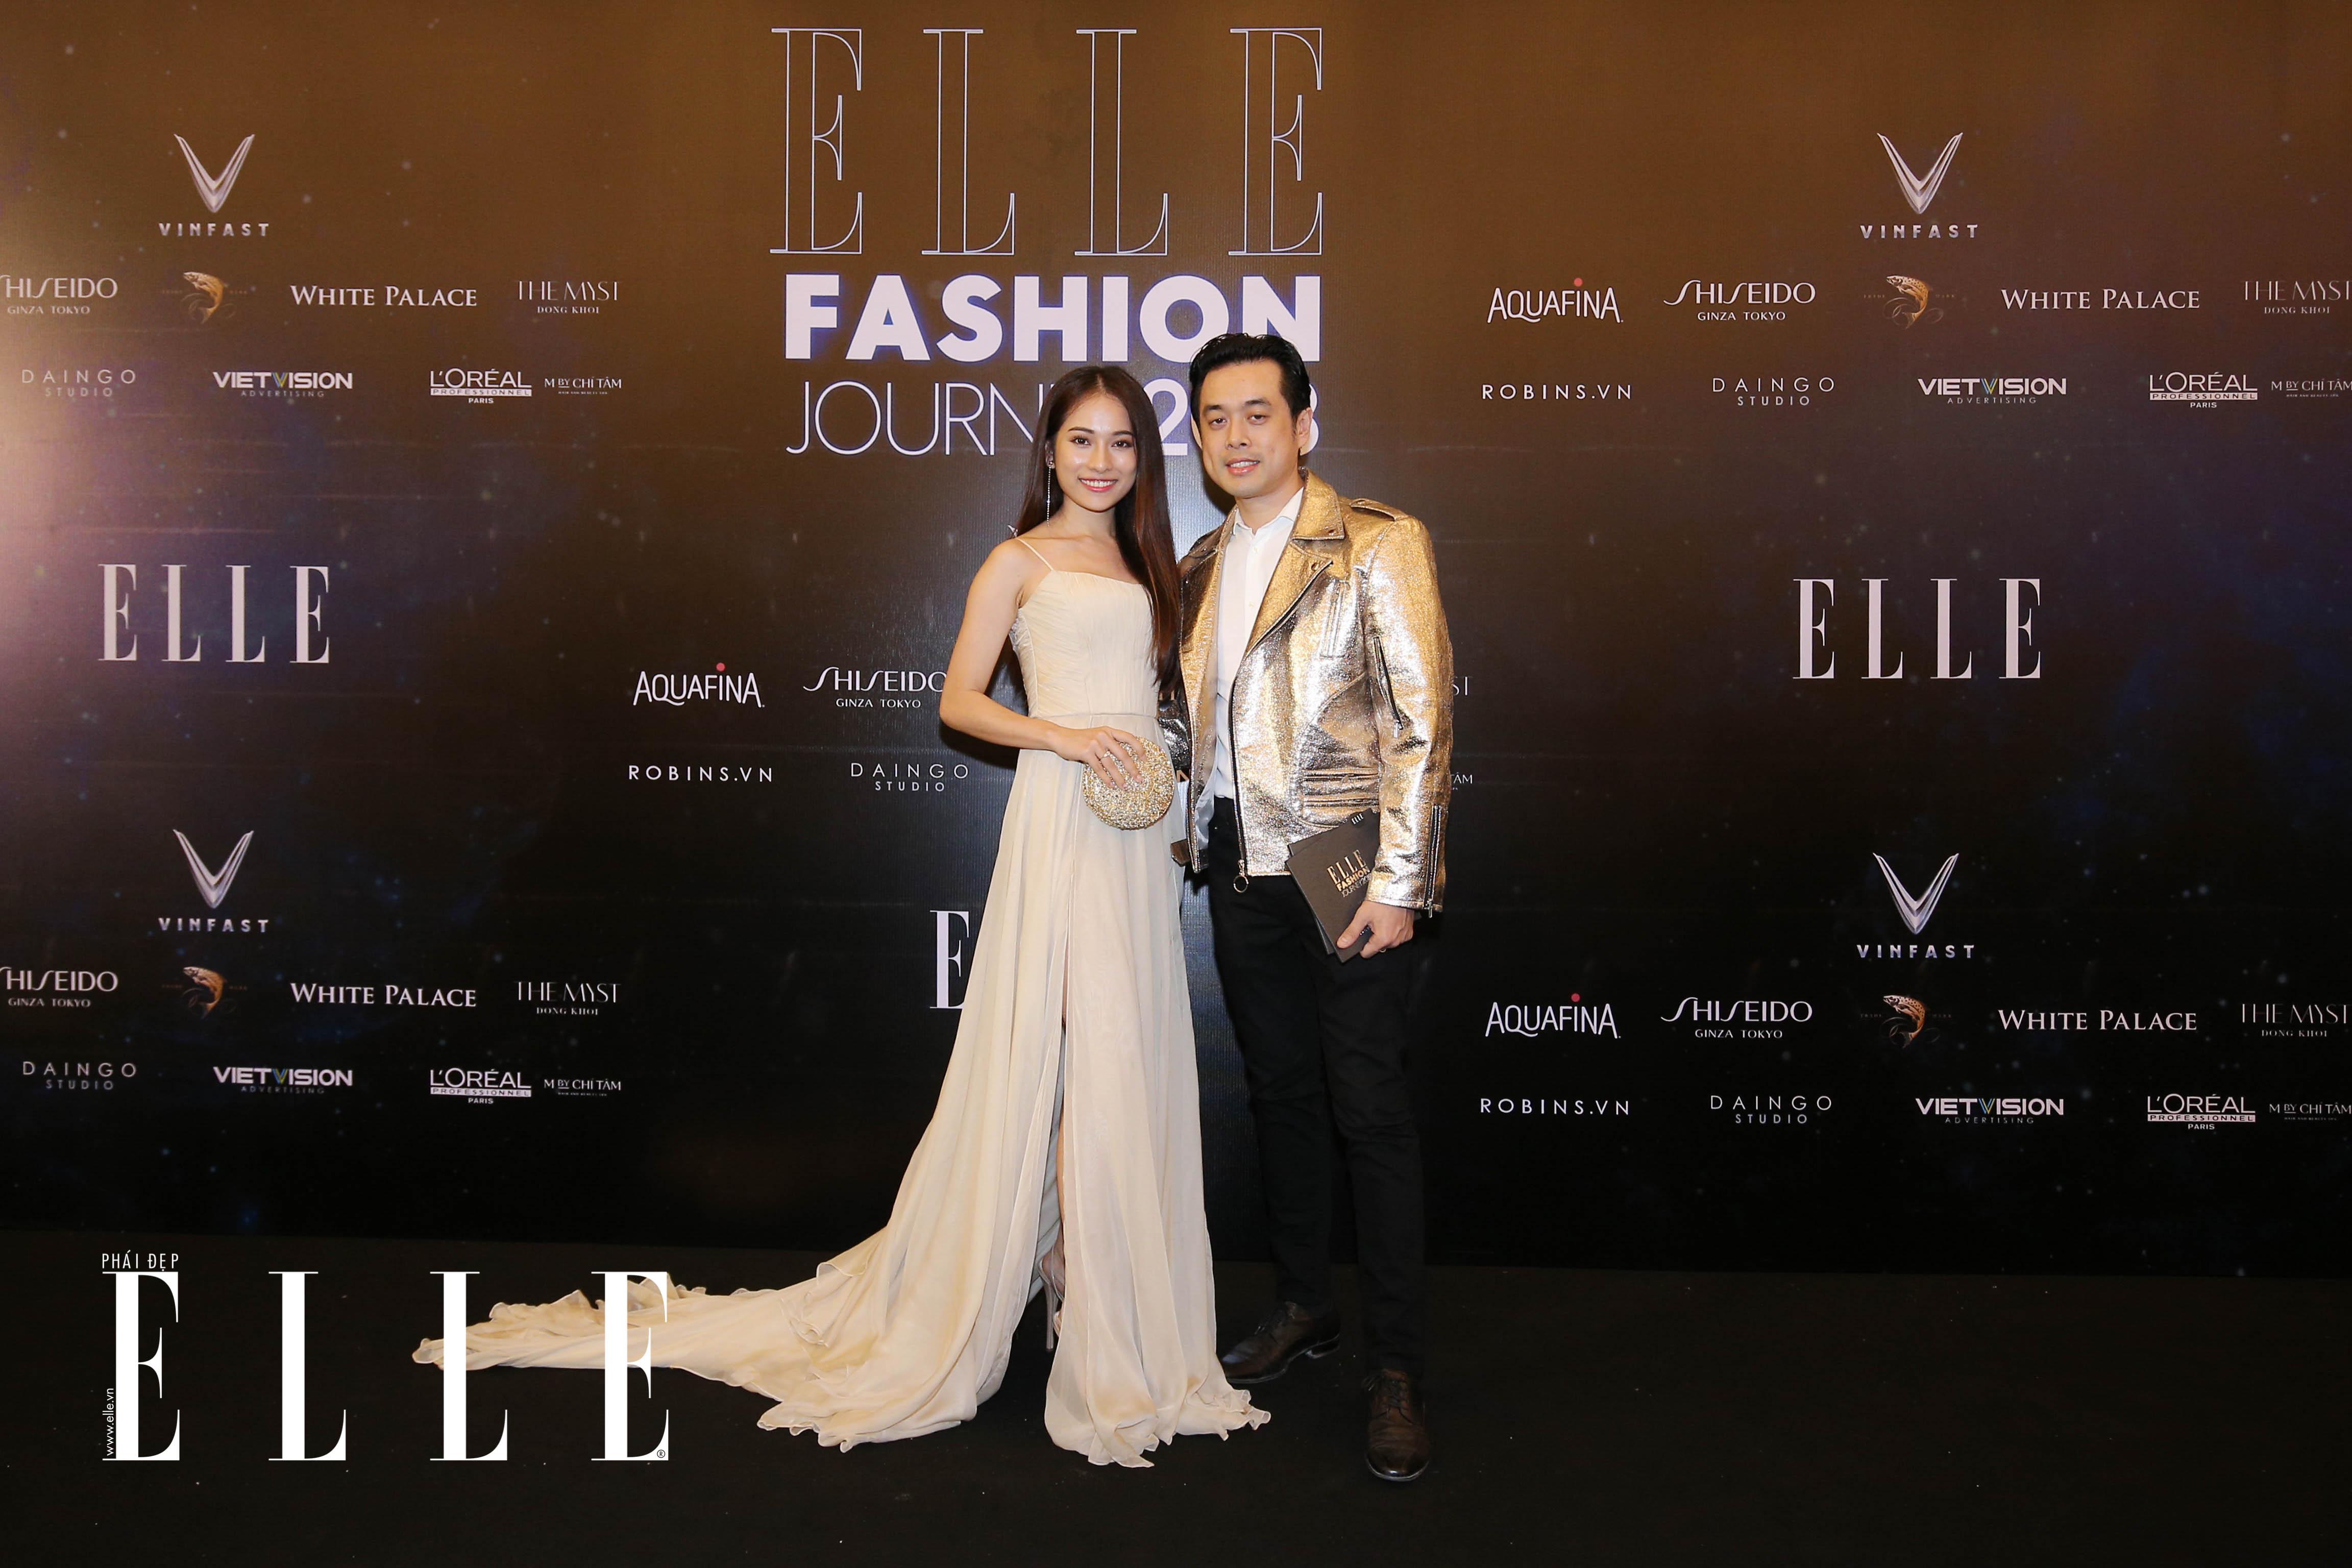 ELLE Fashion Journey tham do 13